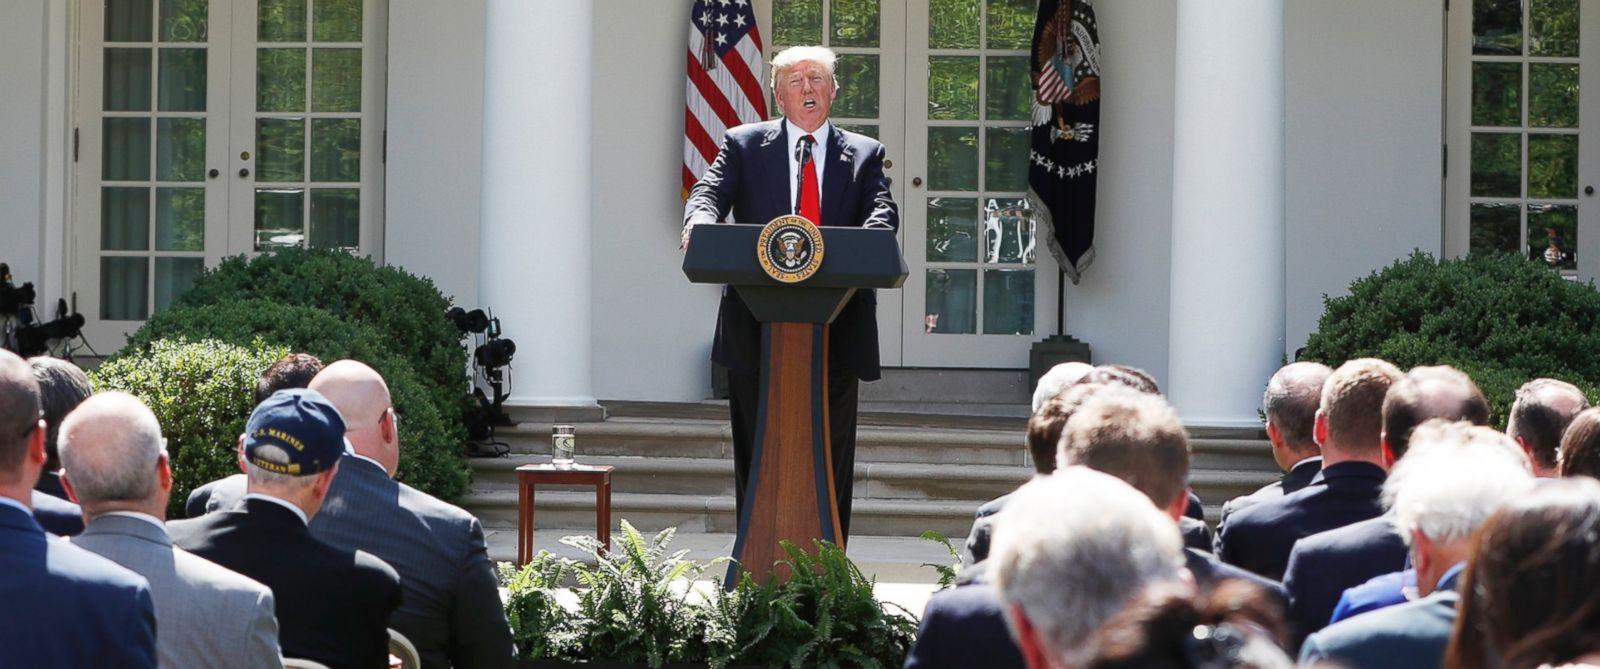 Fact-checking Trump's speech on the Paris Accord - ABC News